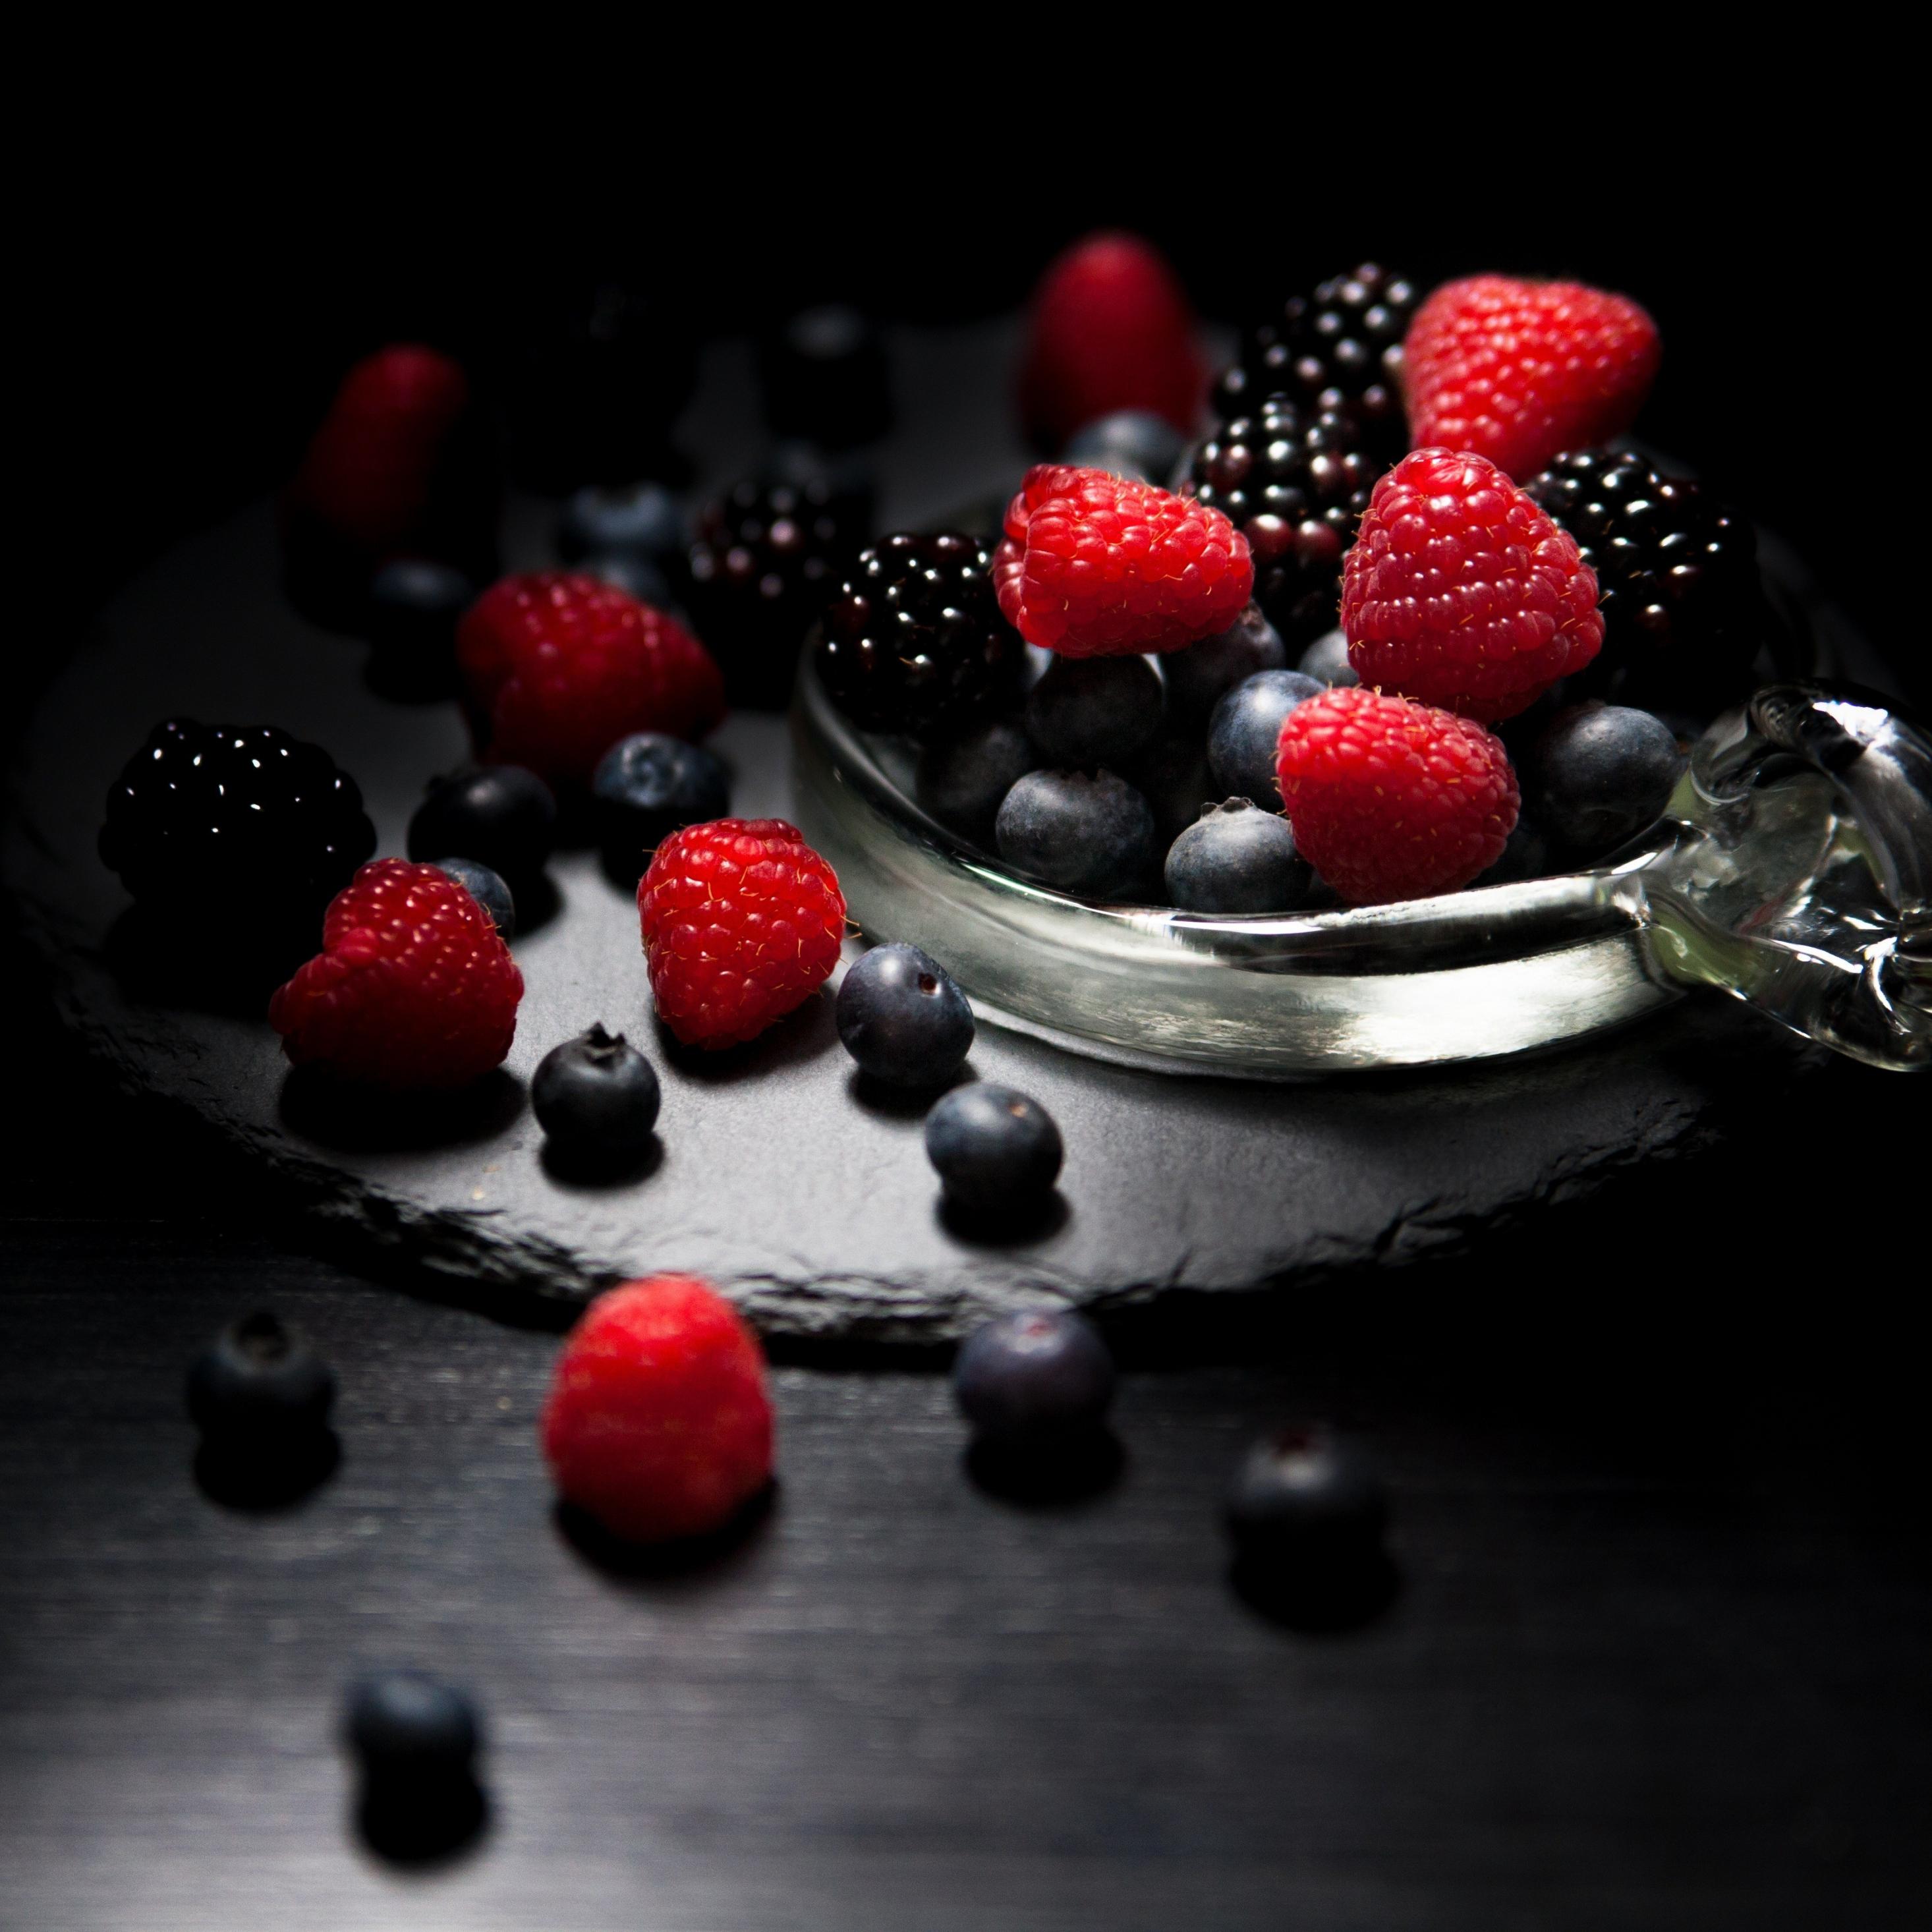 2932x2932 wallpaper Dark mood, food, fruits, blueberry, raspberry, blackberry, 4k